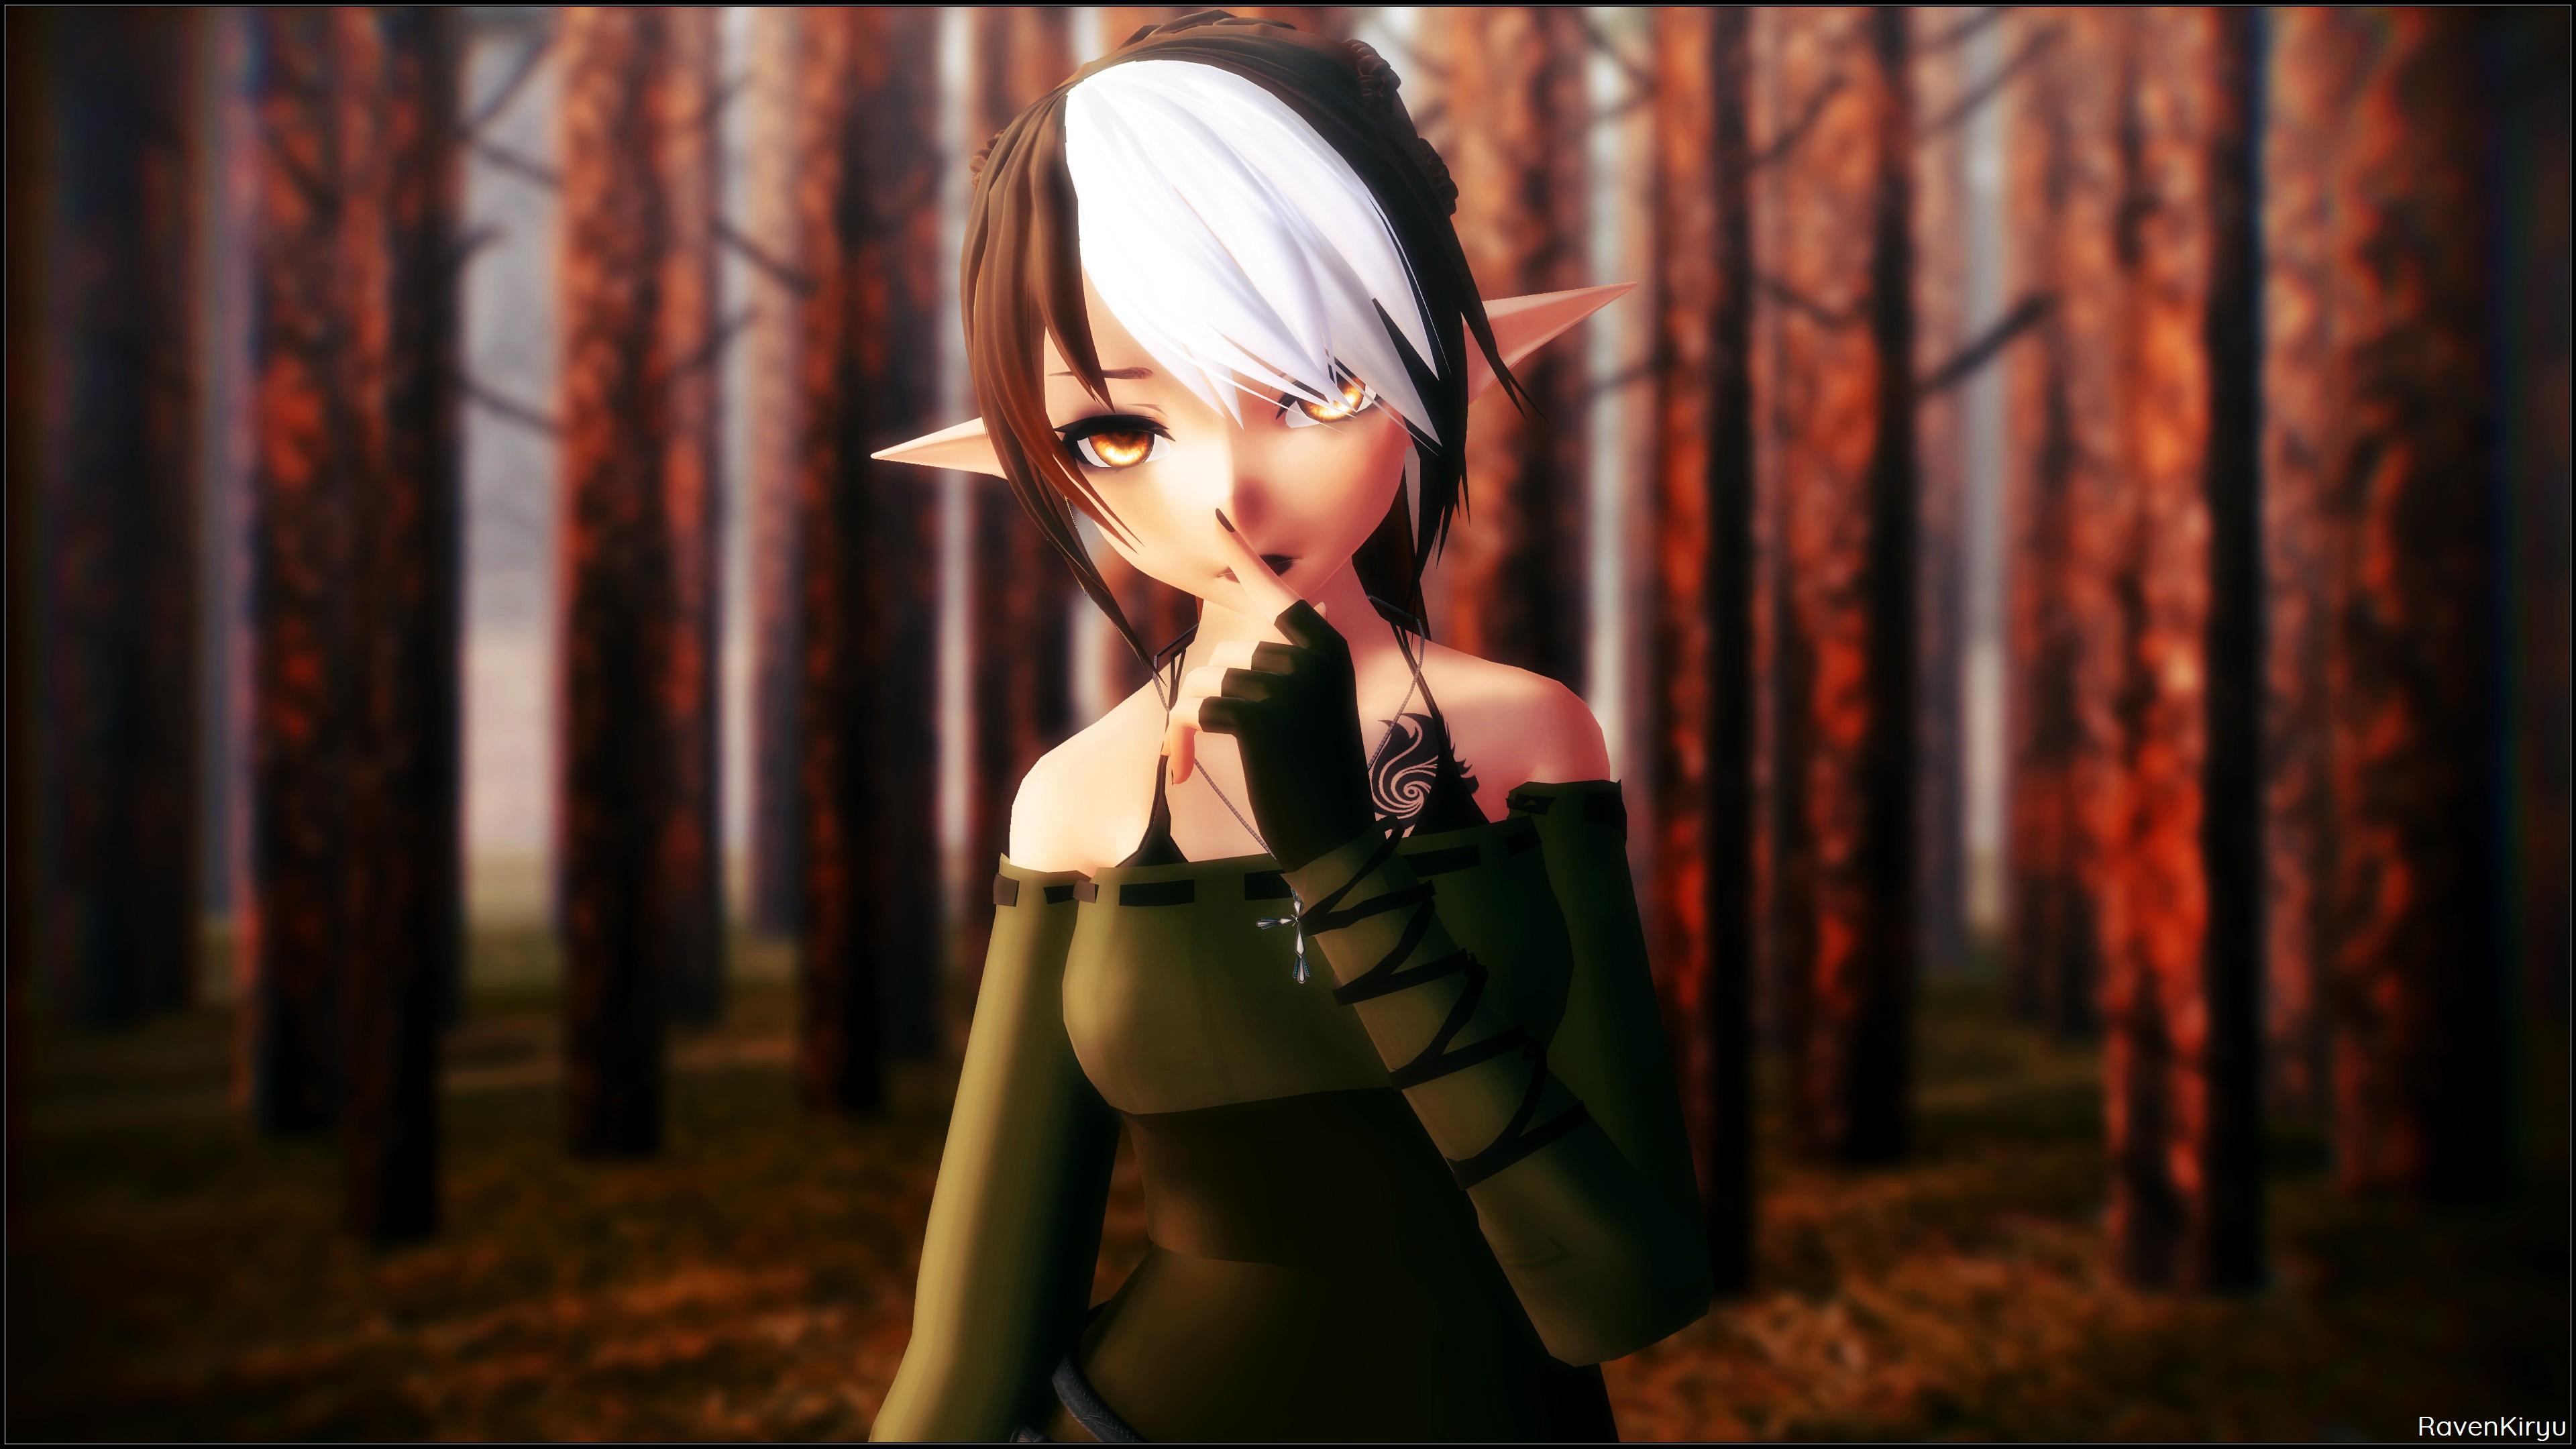 Shhh by RavenKiryu